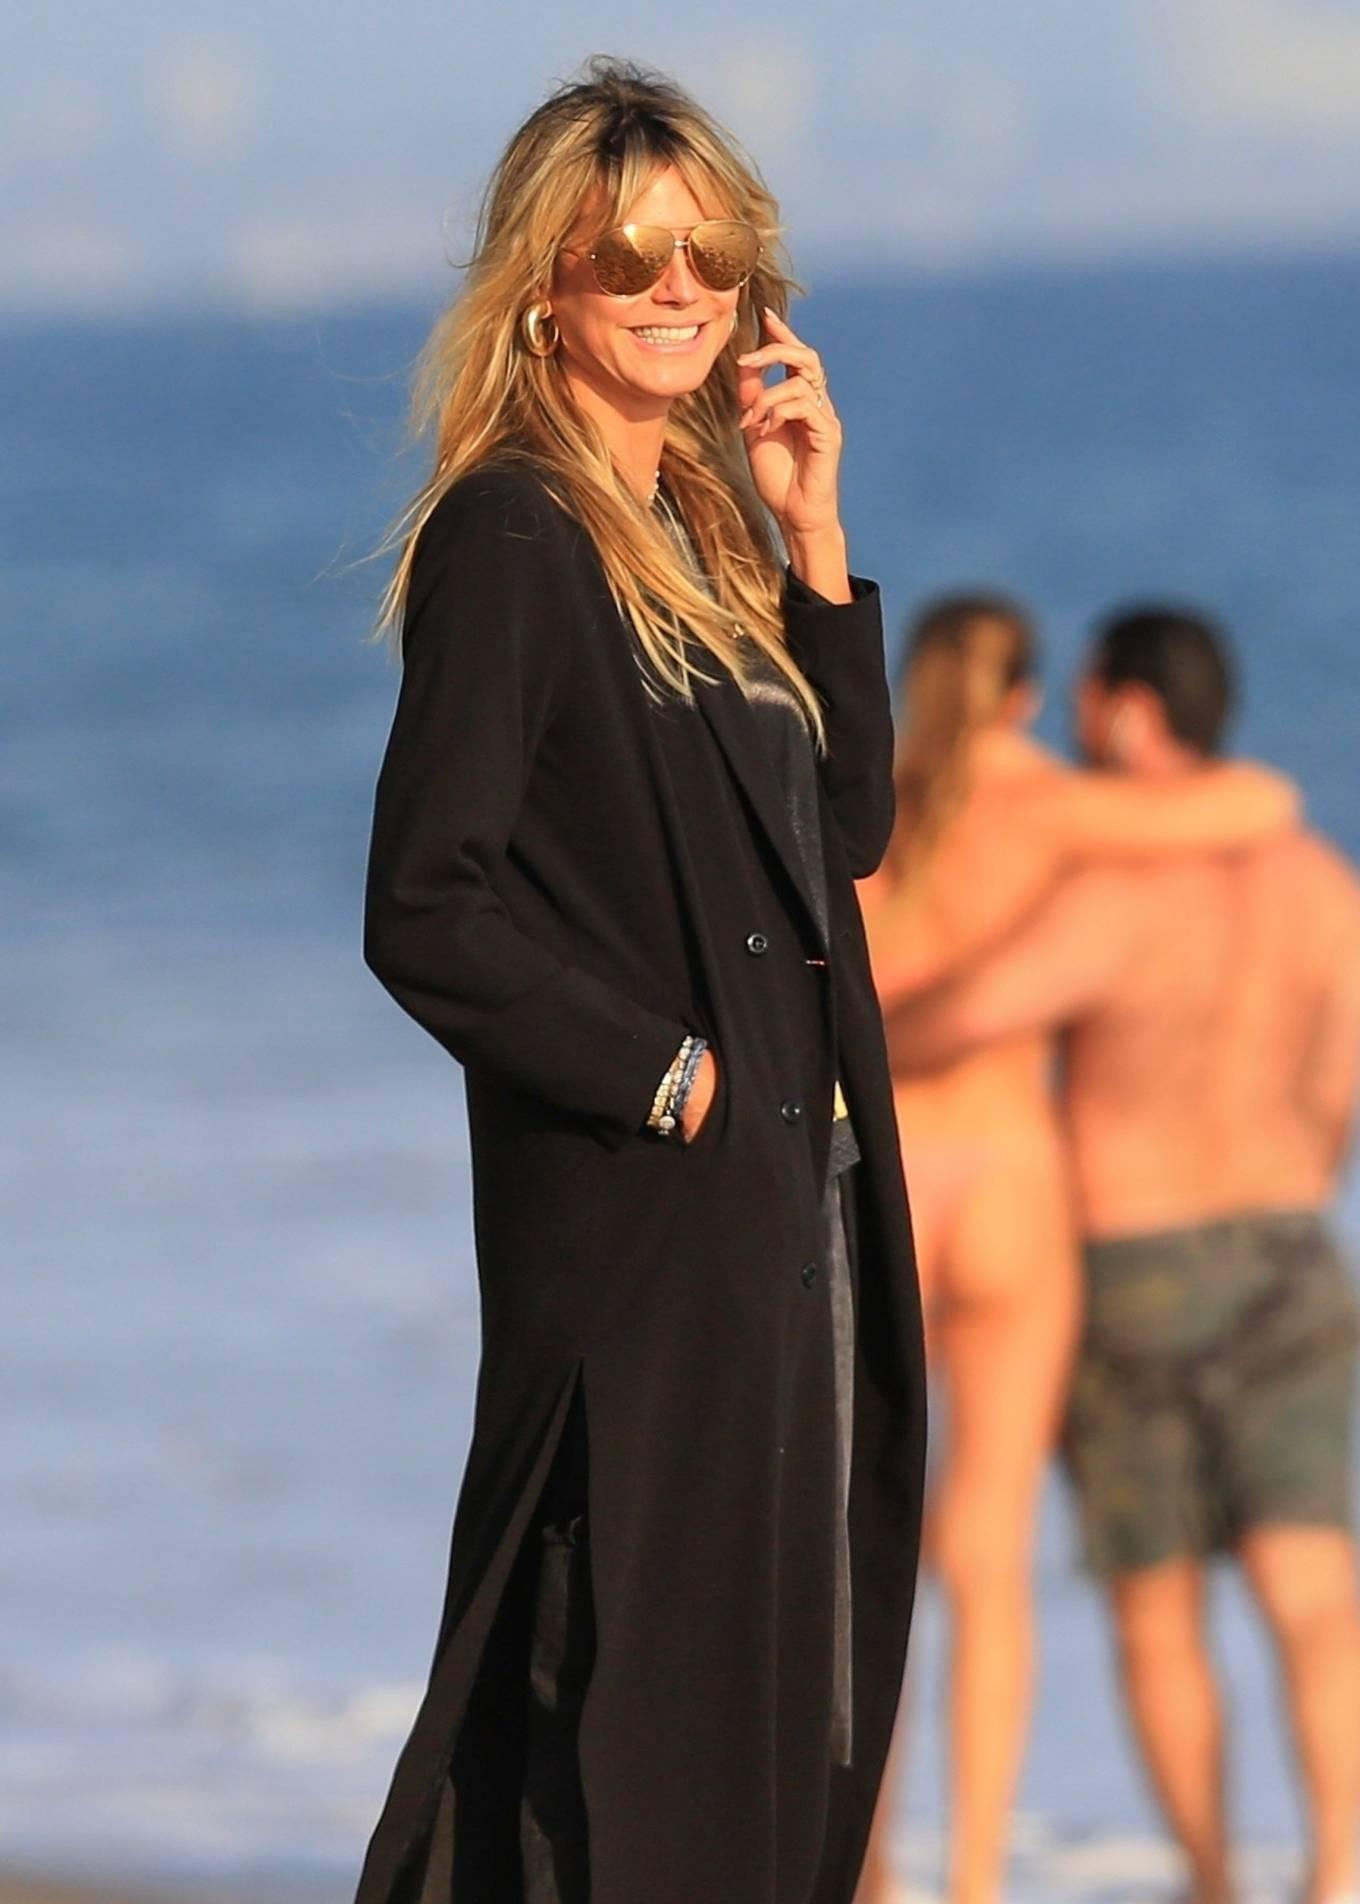 Heidi Klum with her family on the beach in Malibu